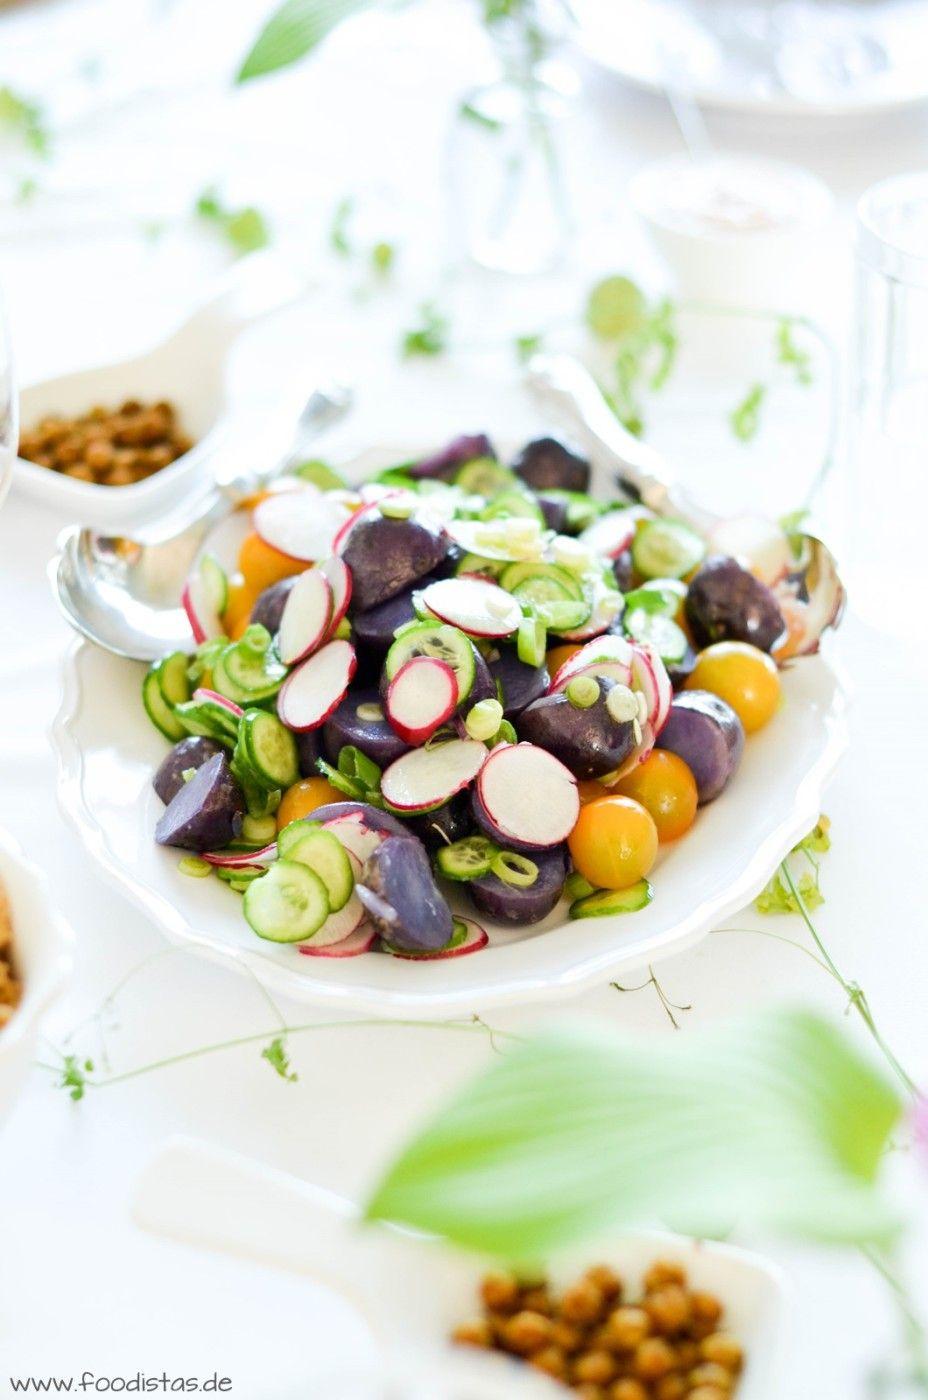 lila kartoffelsalat foodistas food pinterest kartoffelsalat kartoffel und salat. Black Bedroom Furniture Sets. Home Design Ideas